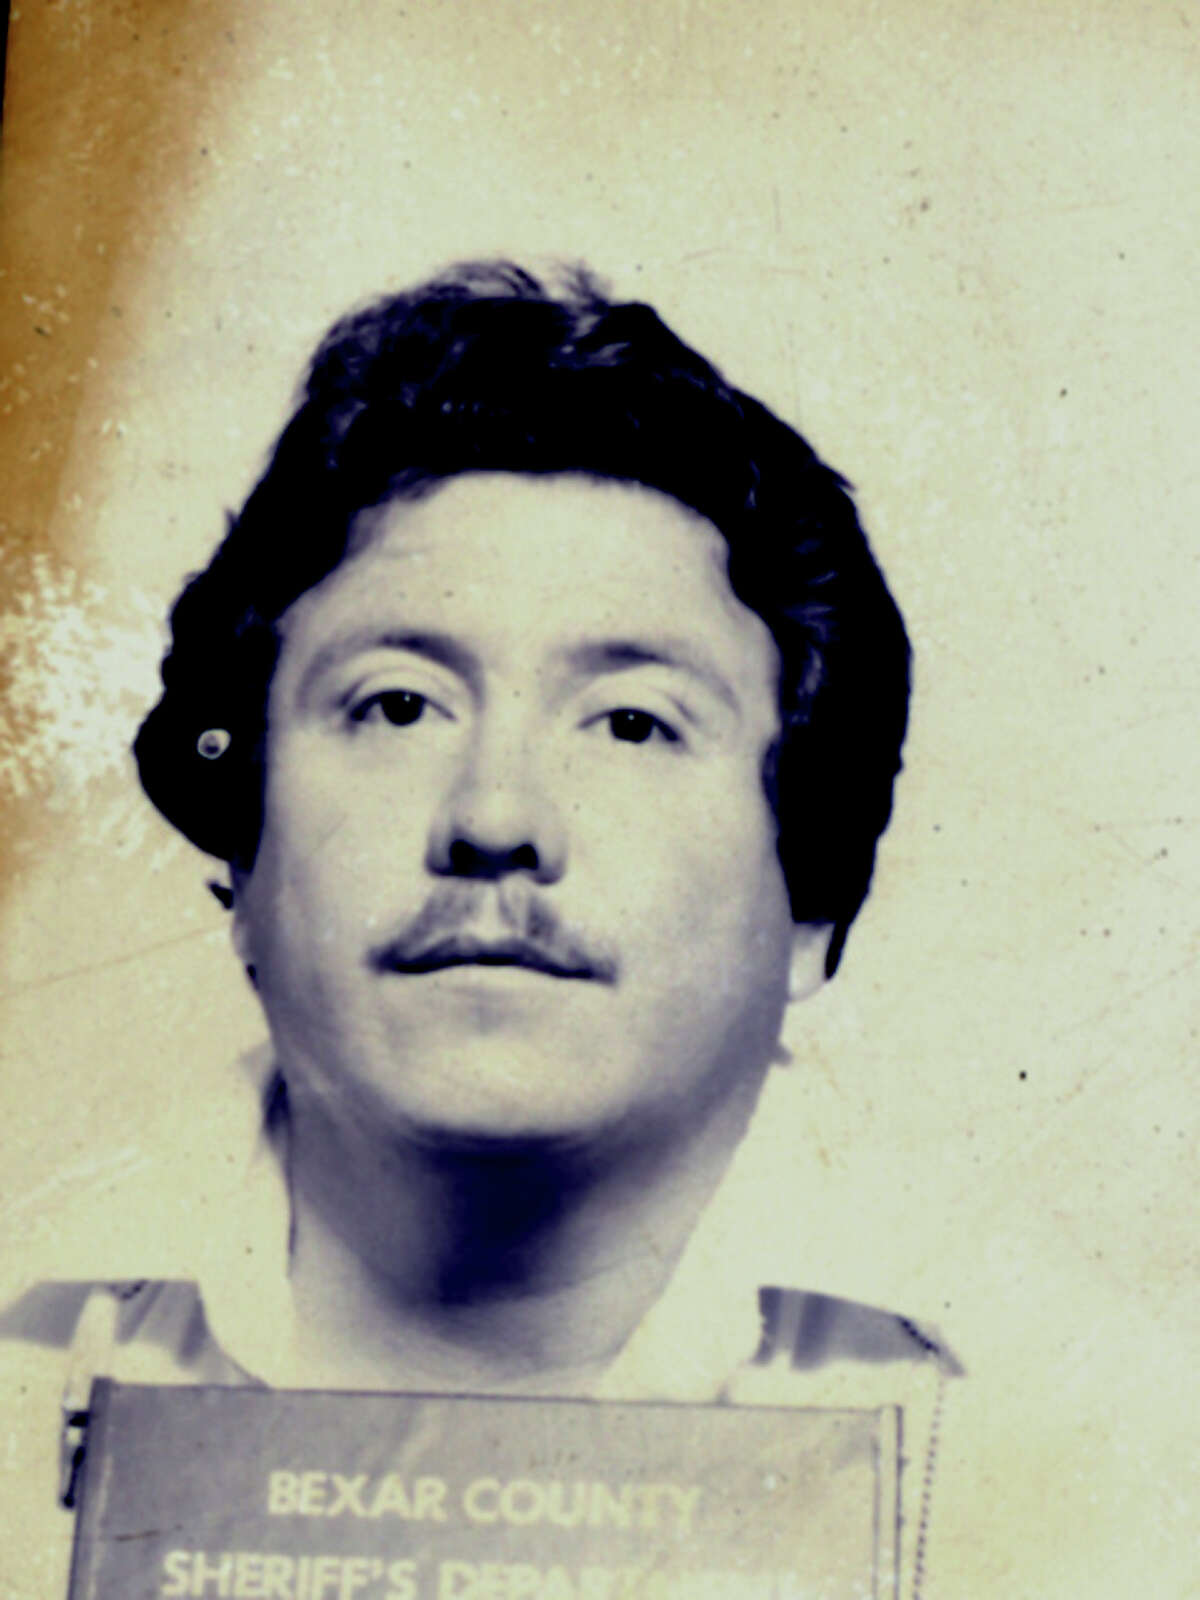 Carlos Faz, date of arrest DWI. 06/26/1983